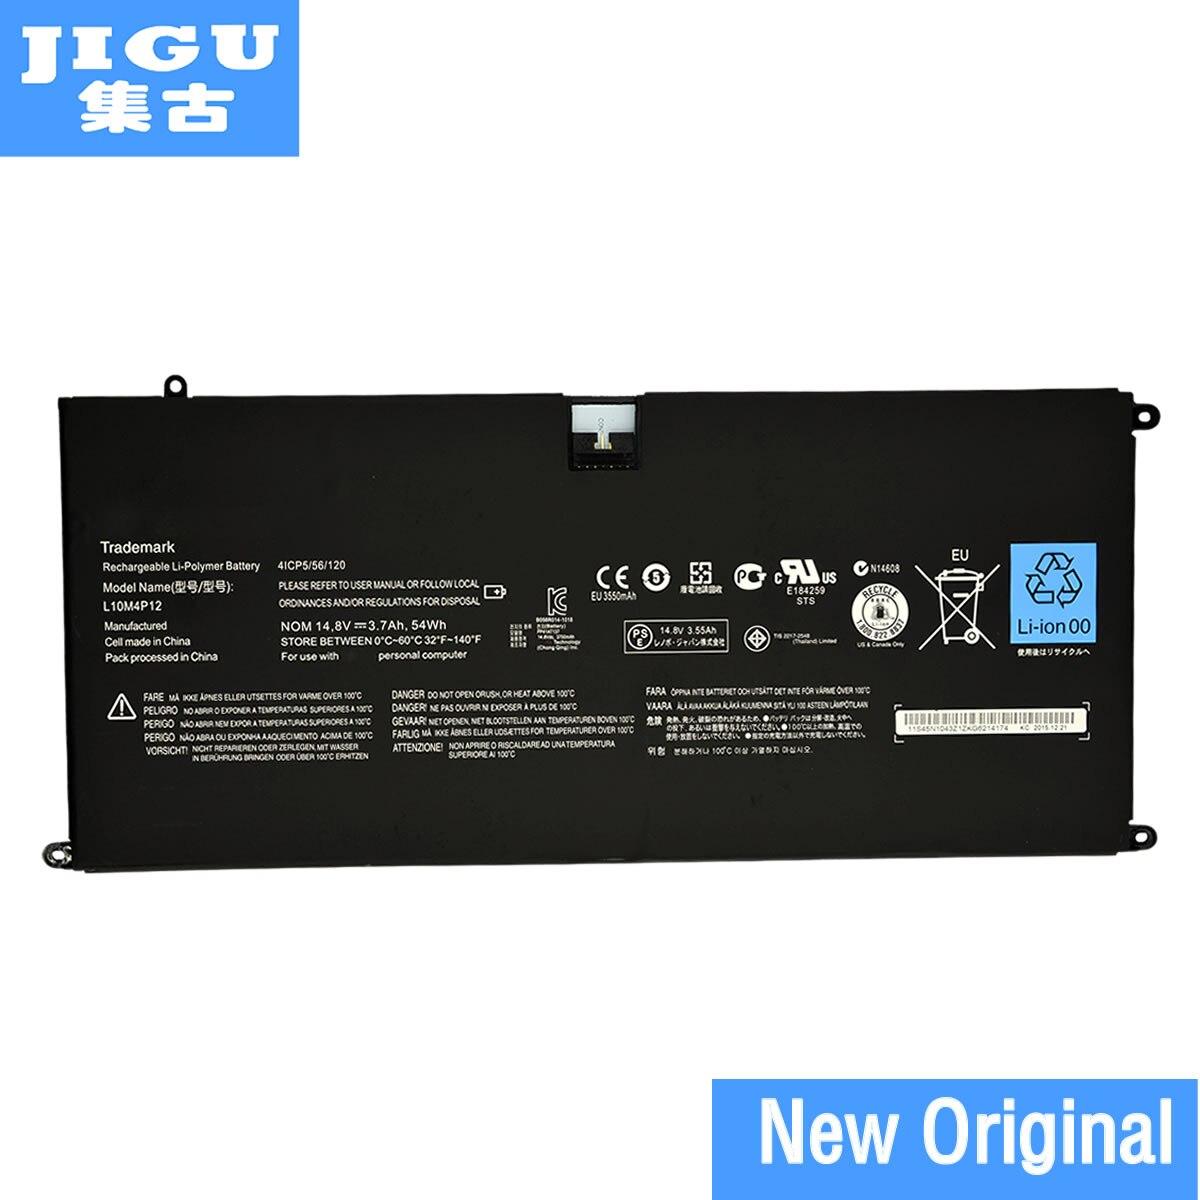 JIGU L10M4P12 4ICP5/56/120 Original Laptop Battery For Lenovo Yoga 13 U300s U300s-IFI U300s-ISE Yoga13-IFI Yoga13-ITH